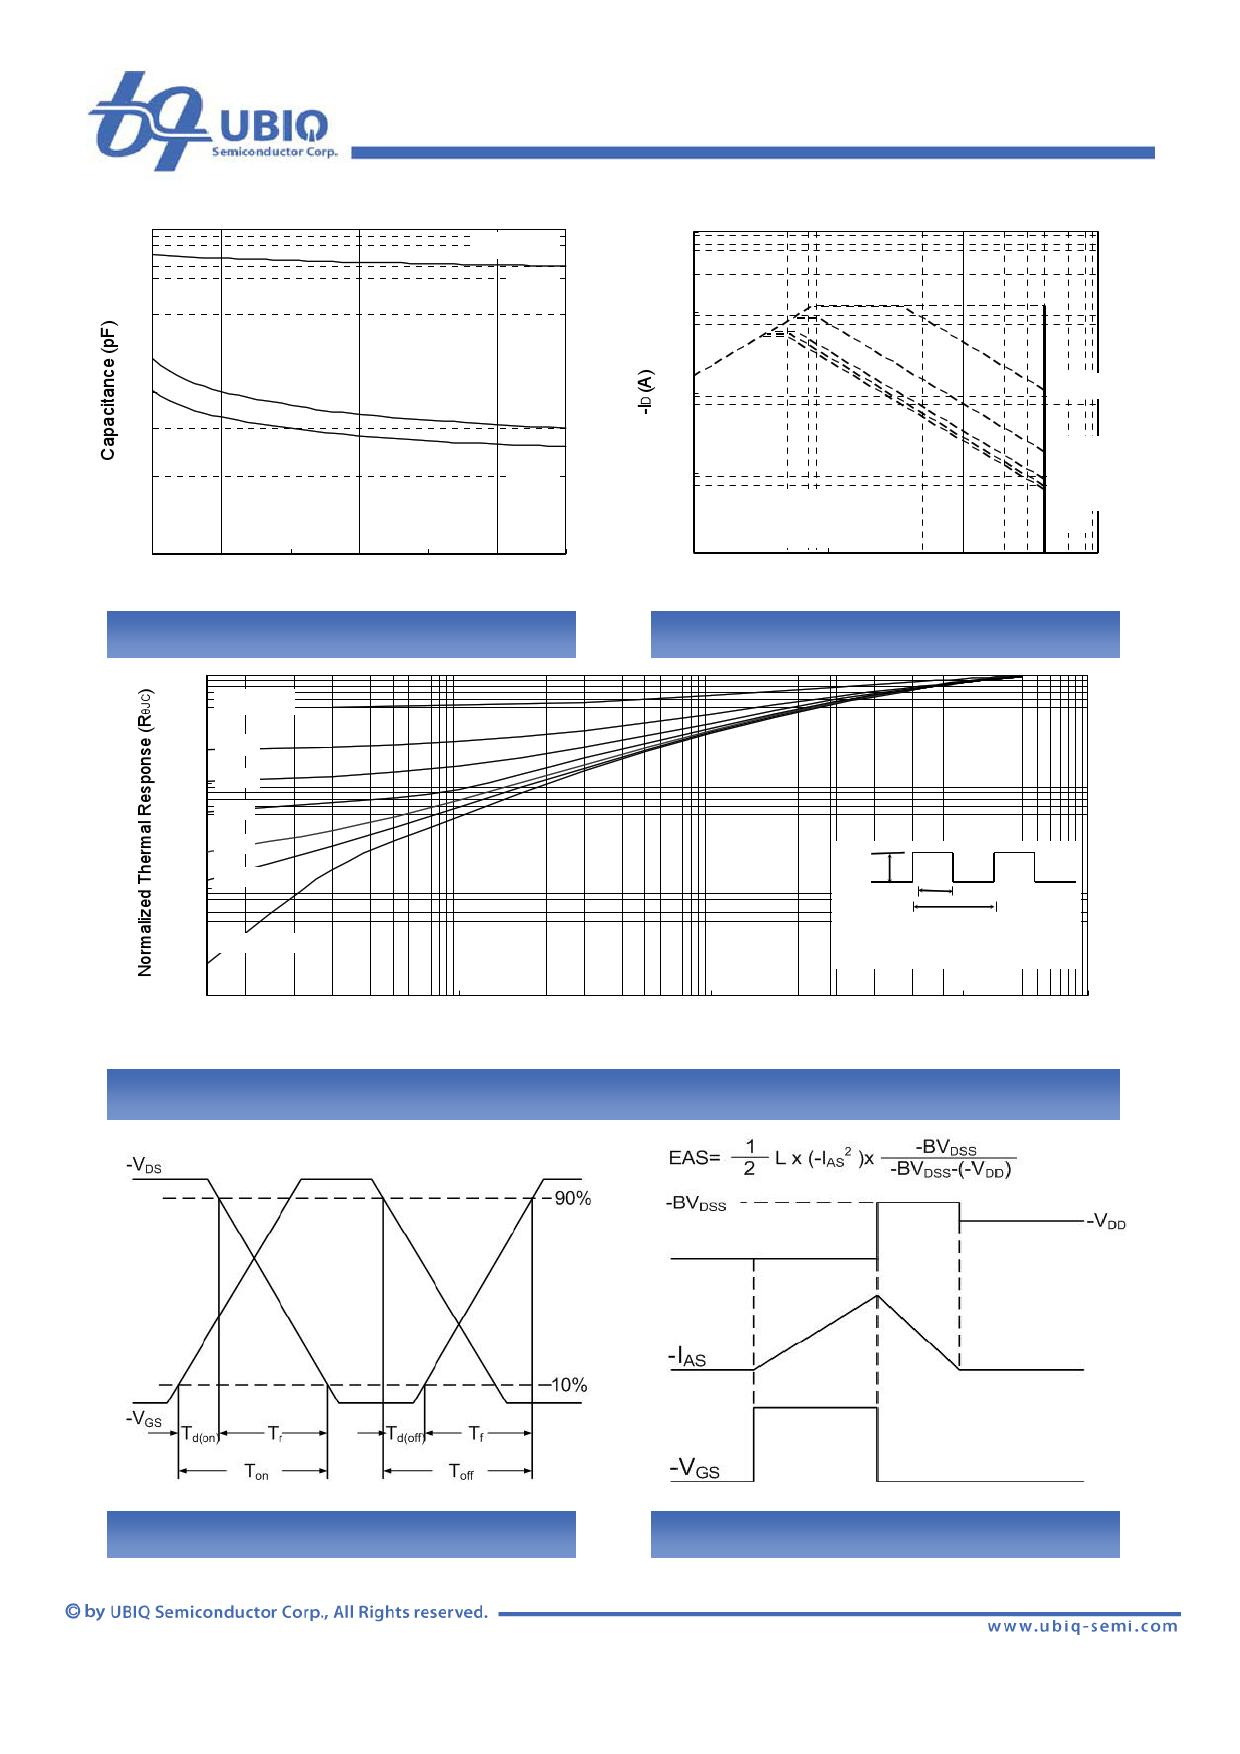 QM4001S pdf, 반도체, 판매, 대치품